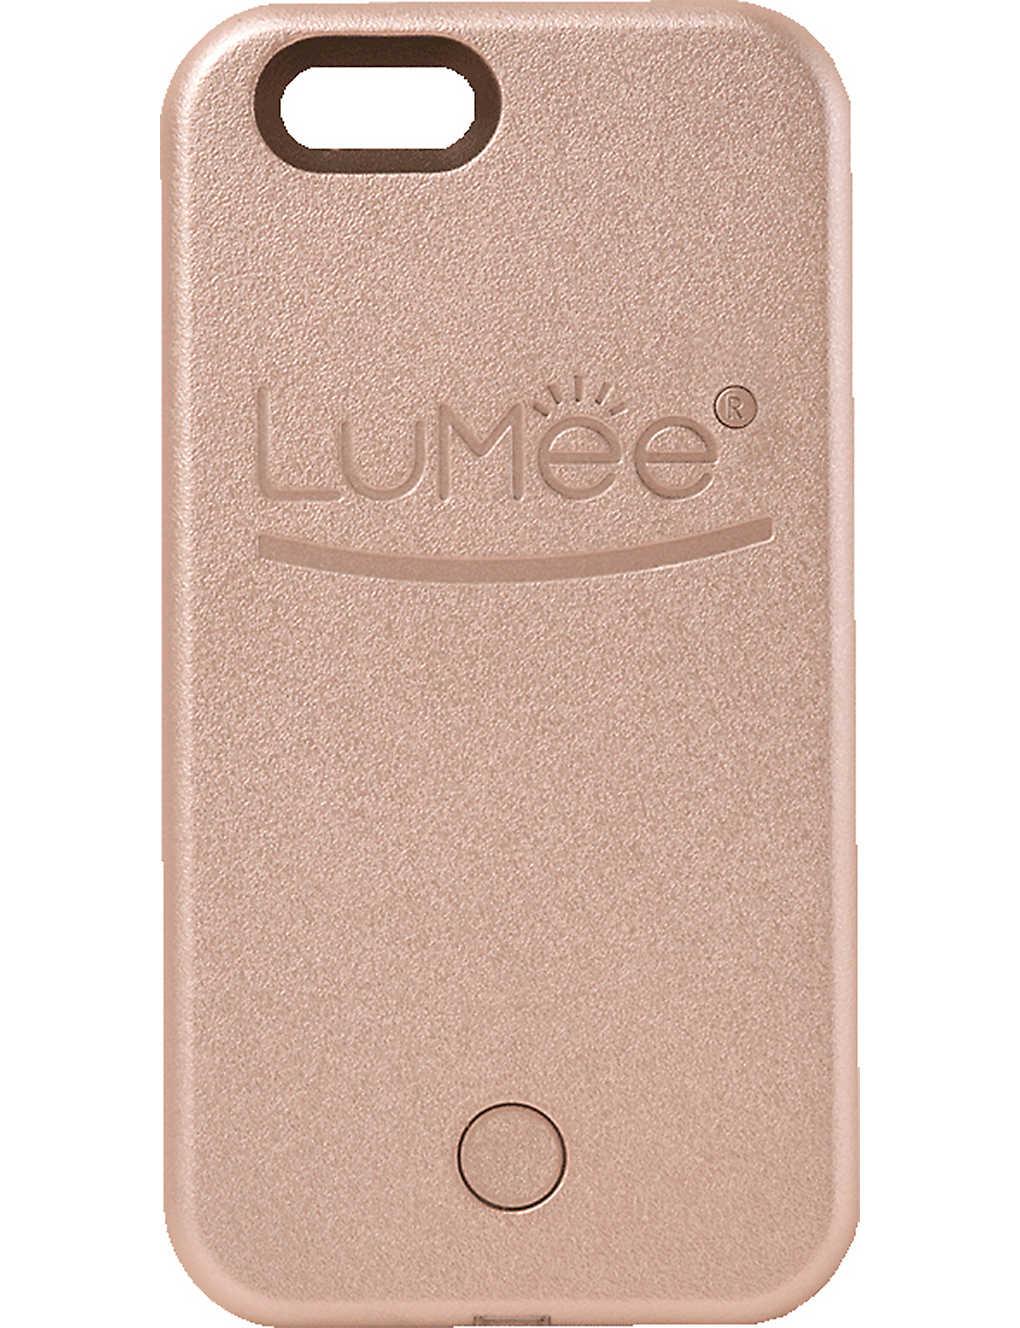 c540743667 LUMEE - Lighted selfie iPhone 6 phone case | Selfridges.com